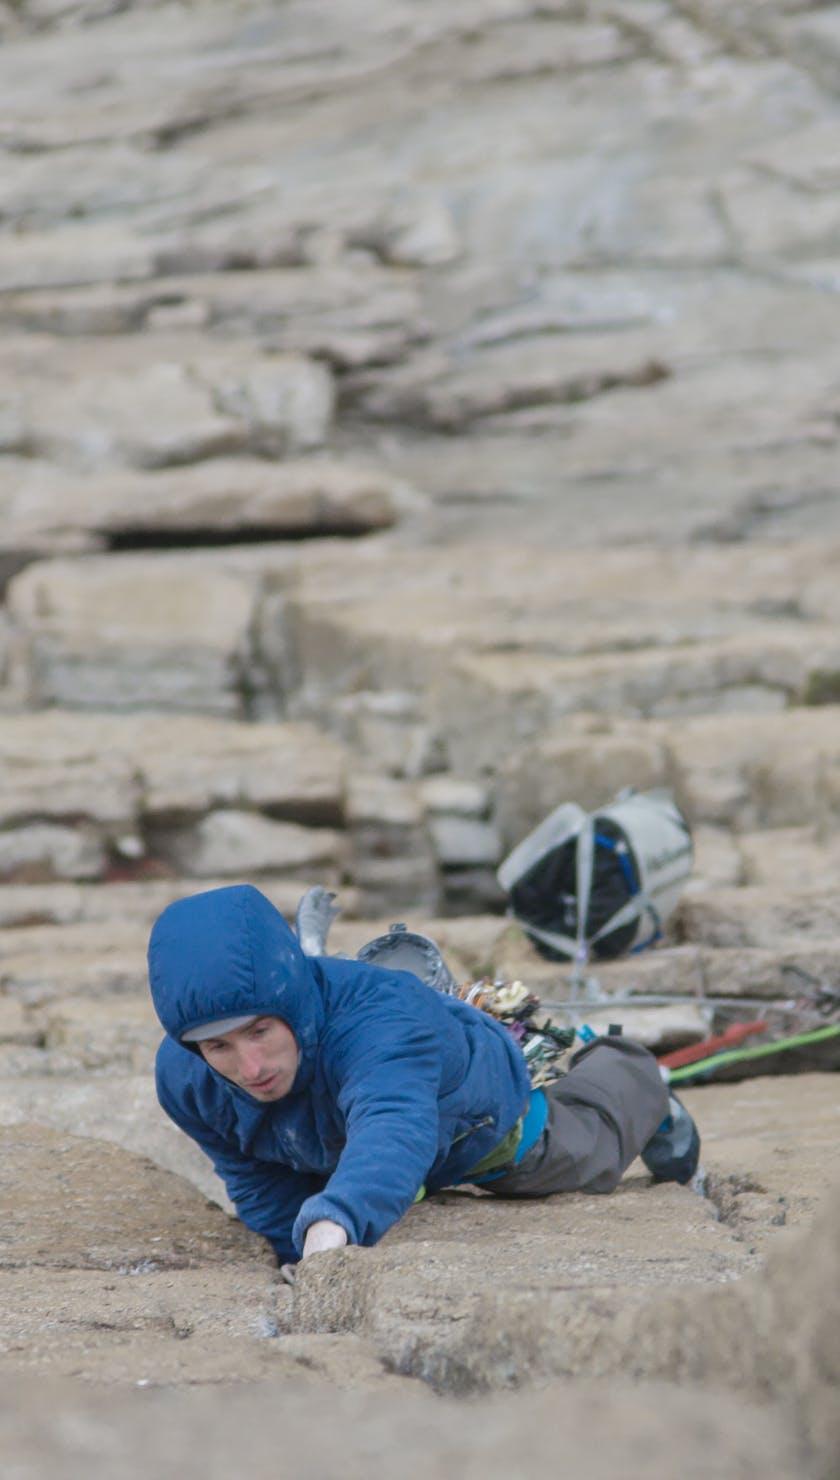 Carlo Traversi climbing